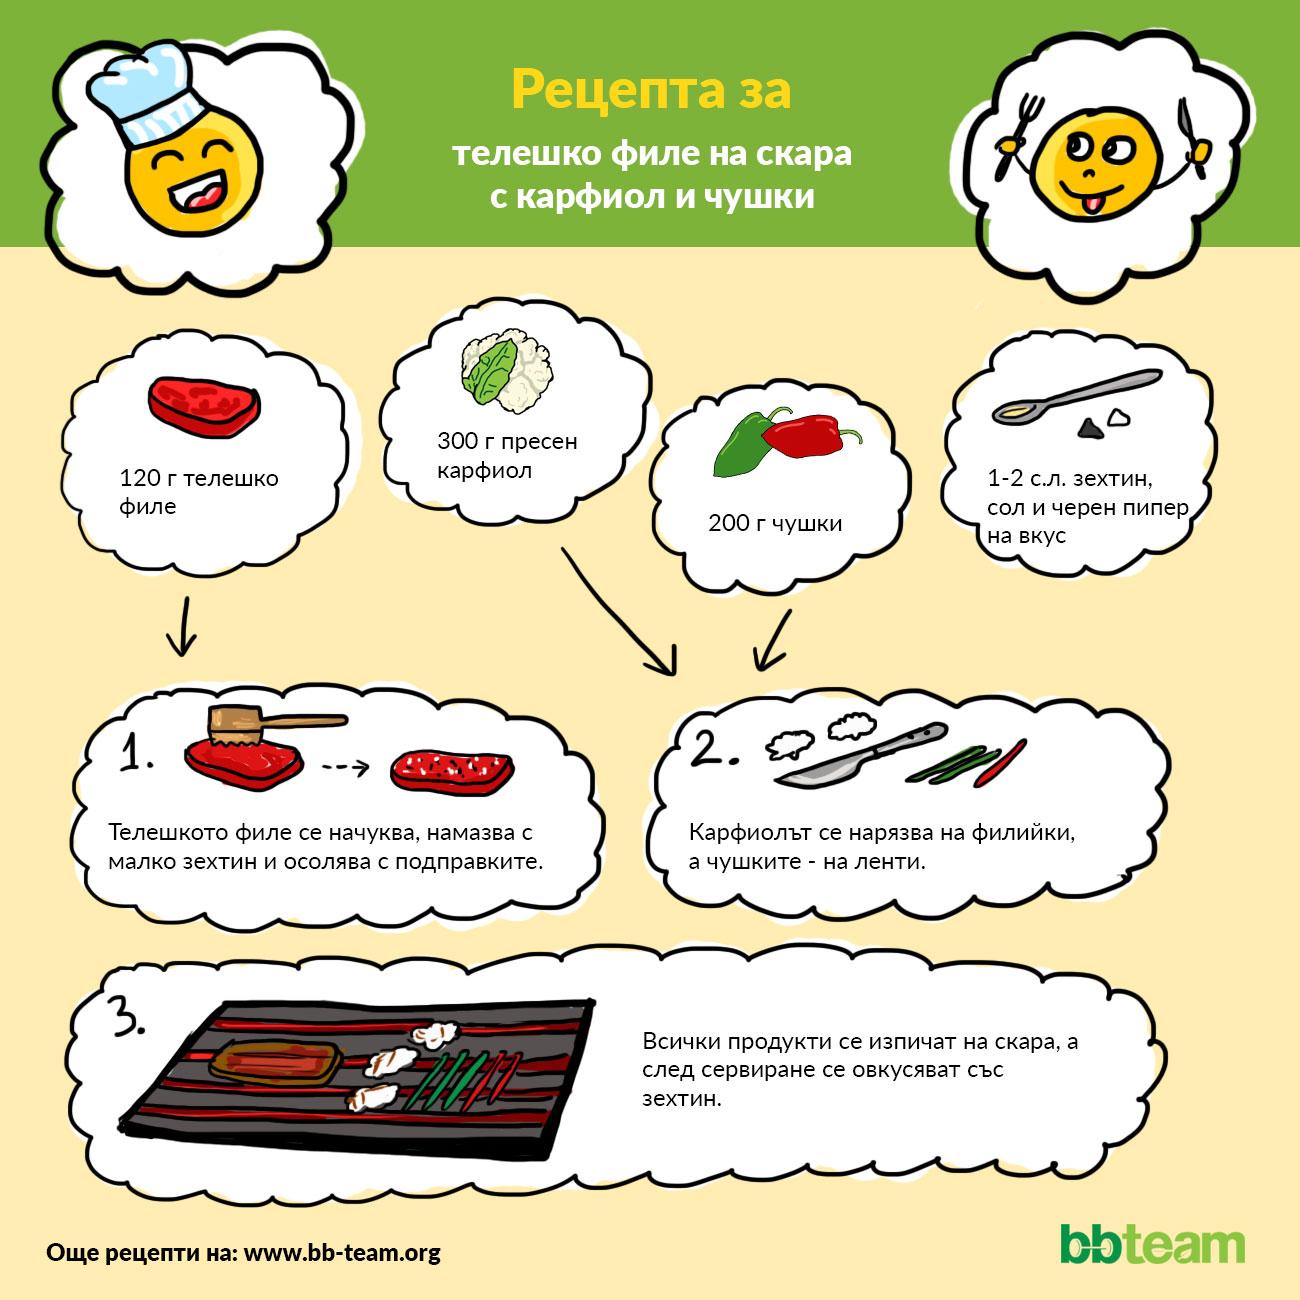 Рецепта за телешко филе на скара с карфиол и чушки [инфографика]